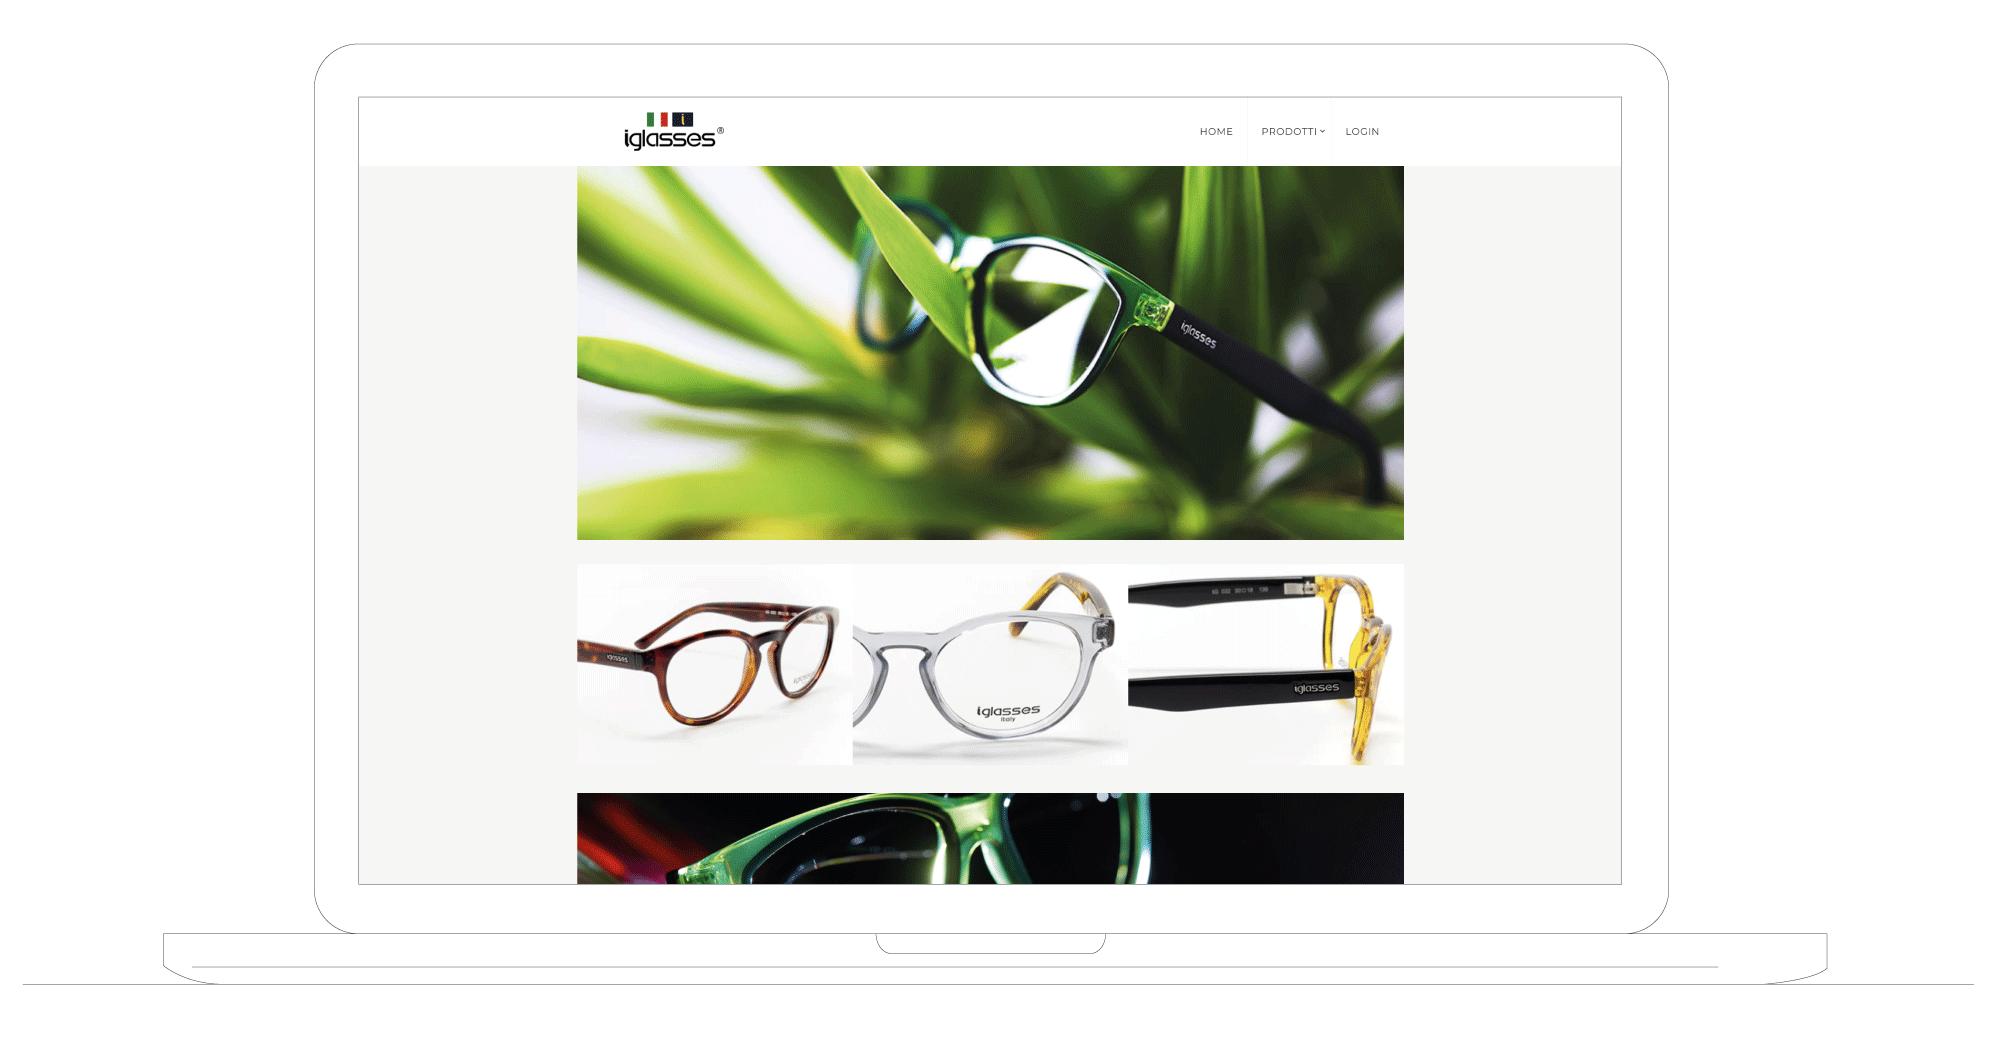 Shop-online-occhiali